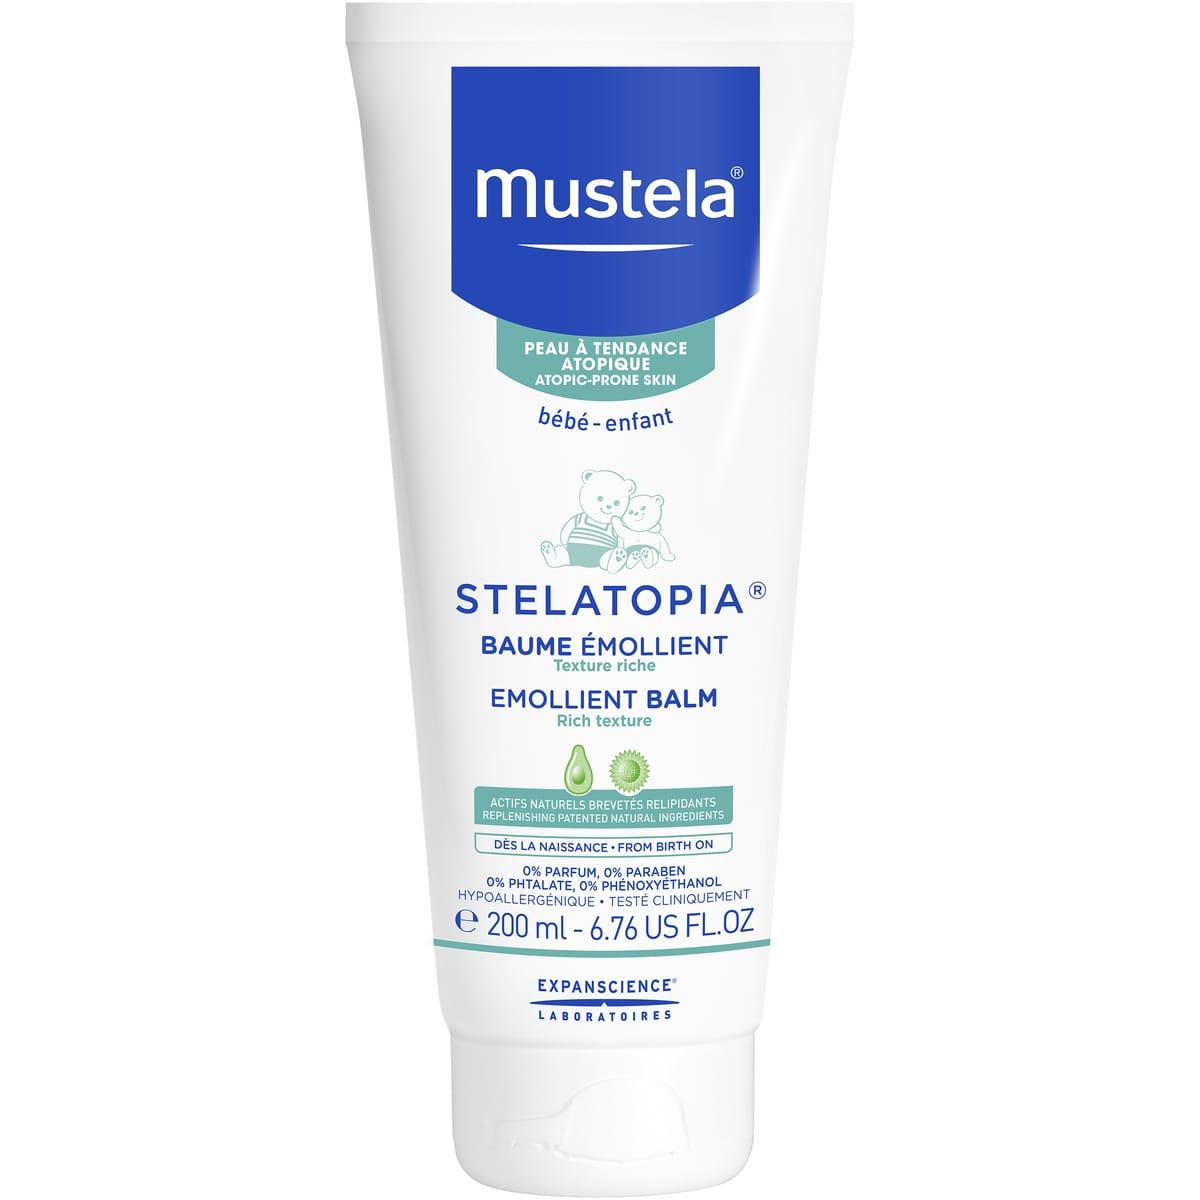 mustela STELATOPIA® Baume relipidant 200ml